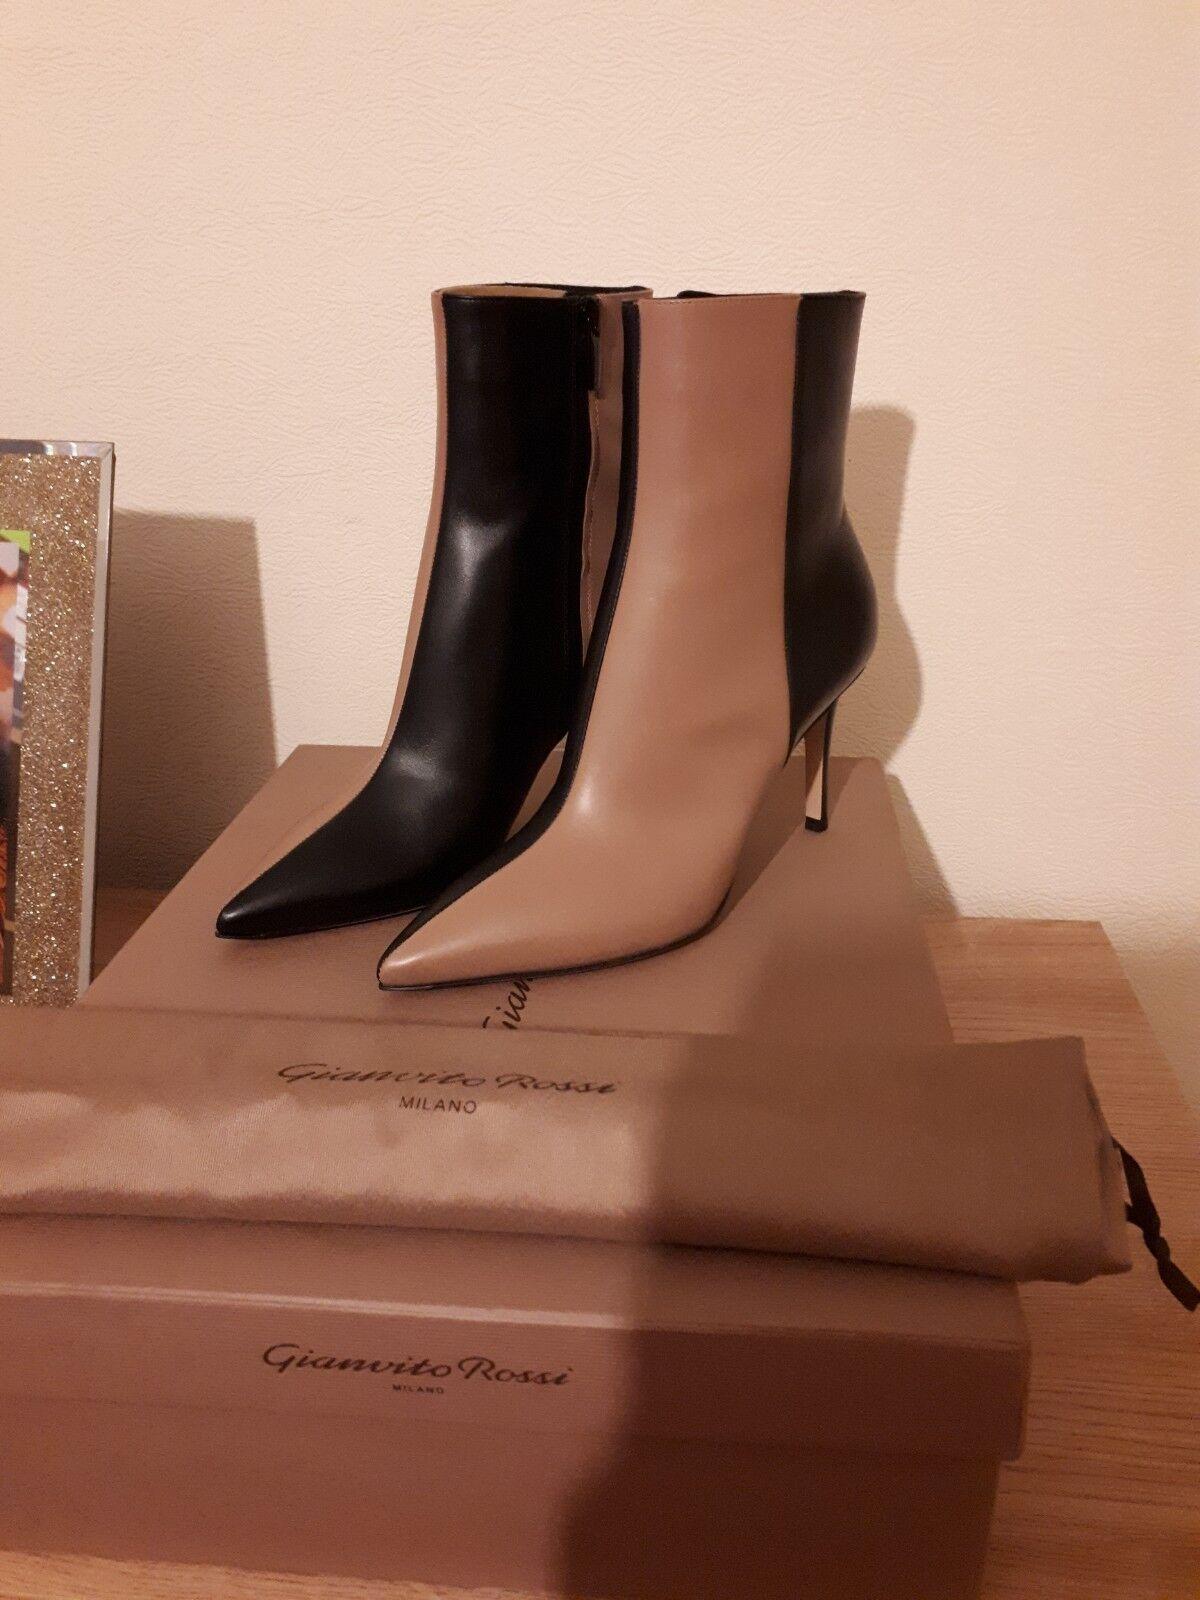 Gianvito Rossi Rossi Rossi Leather Ankle Stiefel Eu Größe 37, Uk Größe 4 59b524